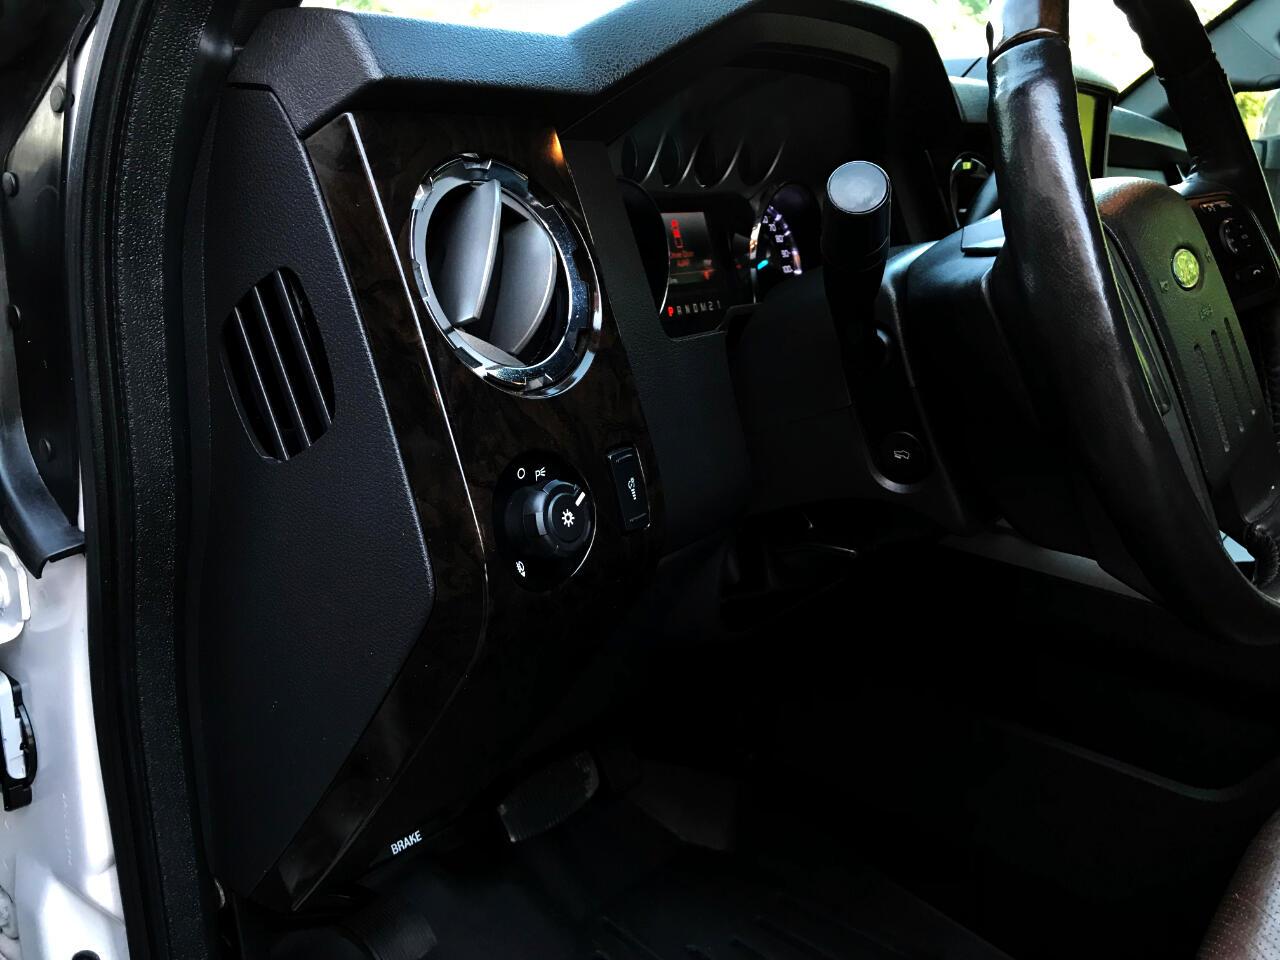 2015 Ford F-250 SD PLATINUM CREW CAB SHORT BED 4WD CUSTOM LEVELED